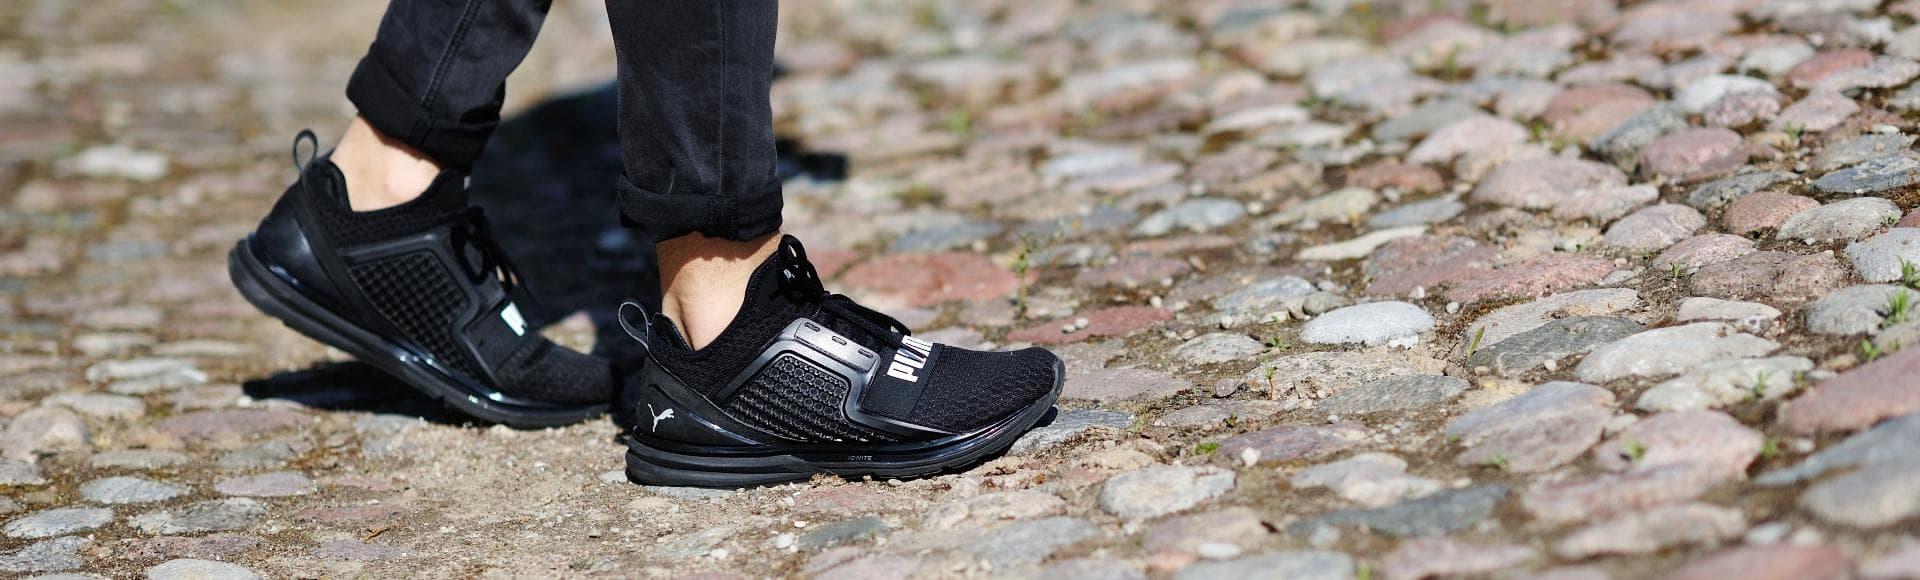 Puma footwear, Puma shoes - Sportsman24